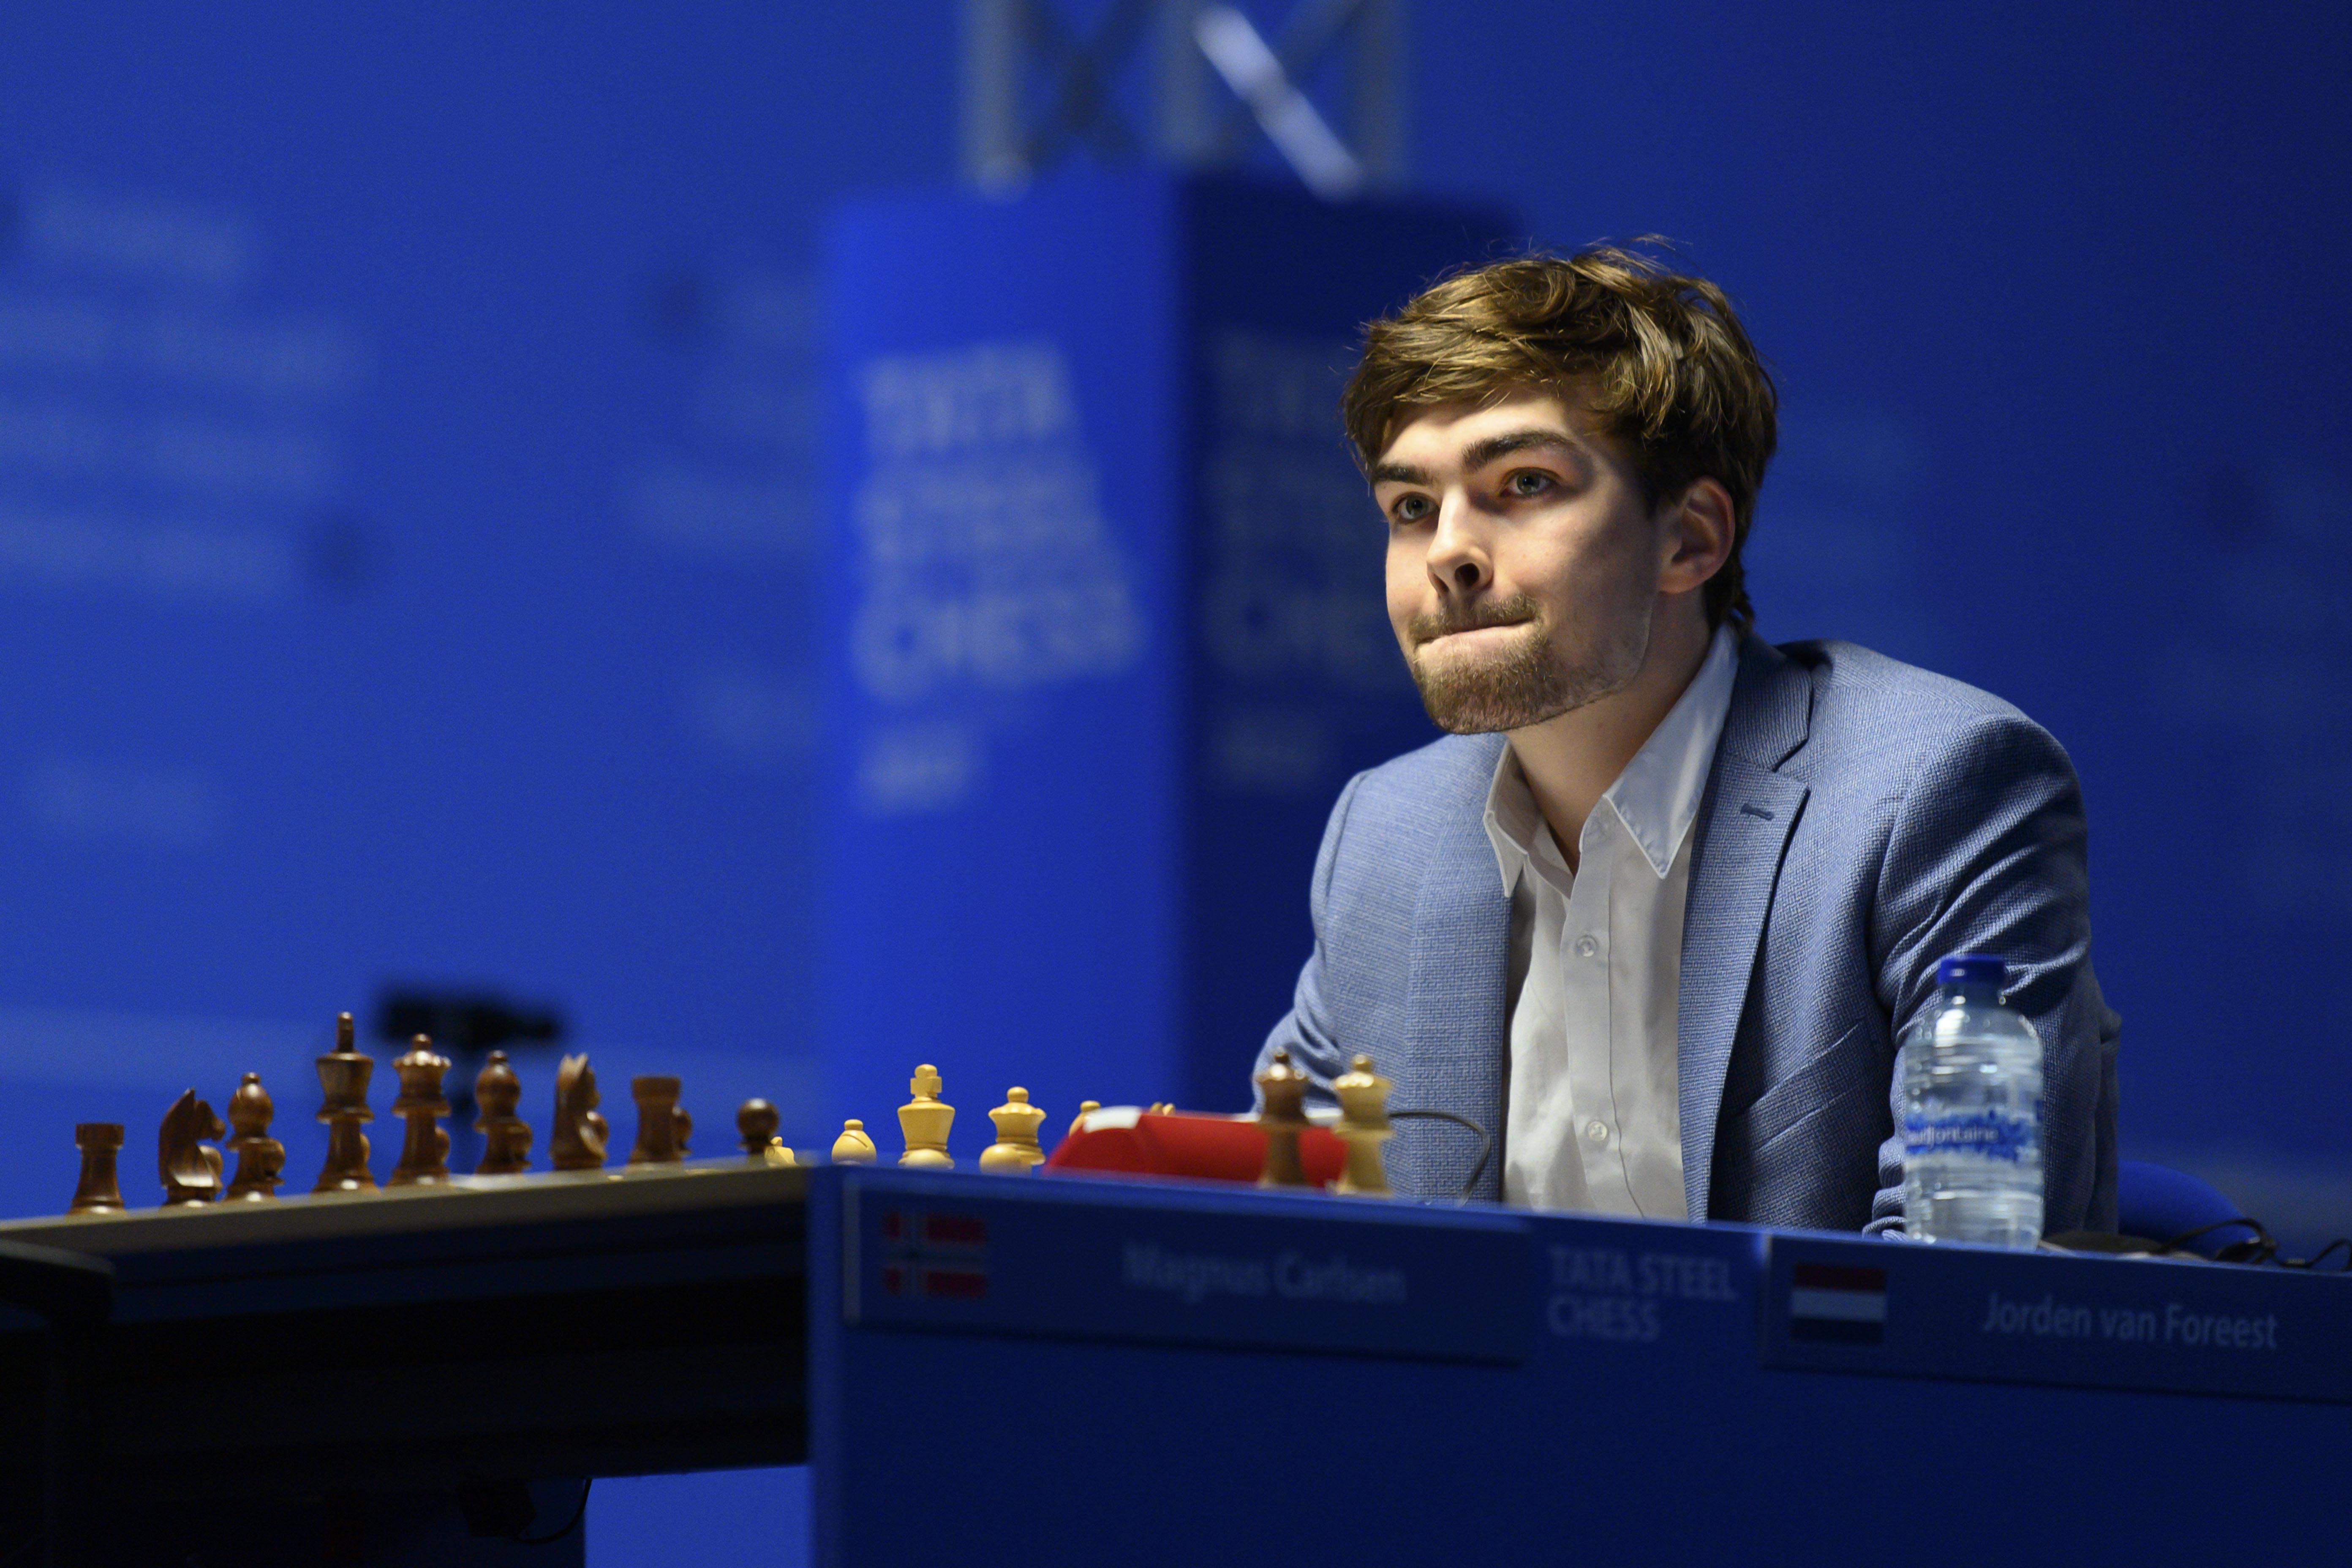 Jorden van Foreest wint praktisch (maar mooi had ook gekund): dit is wat grootmeester Dimitri Reinderman opviel tijdens Tata Steel Chess